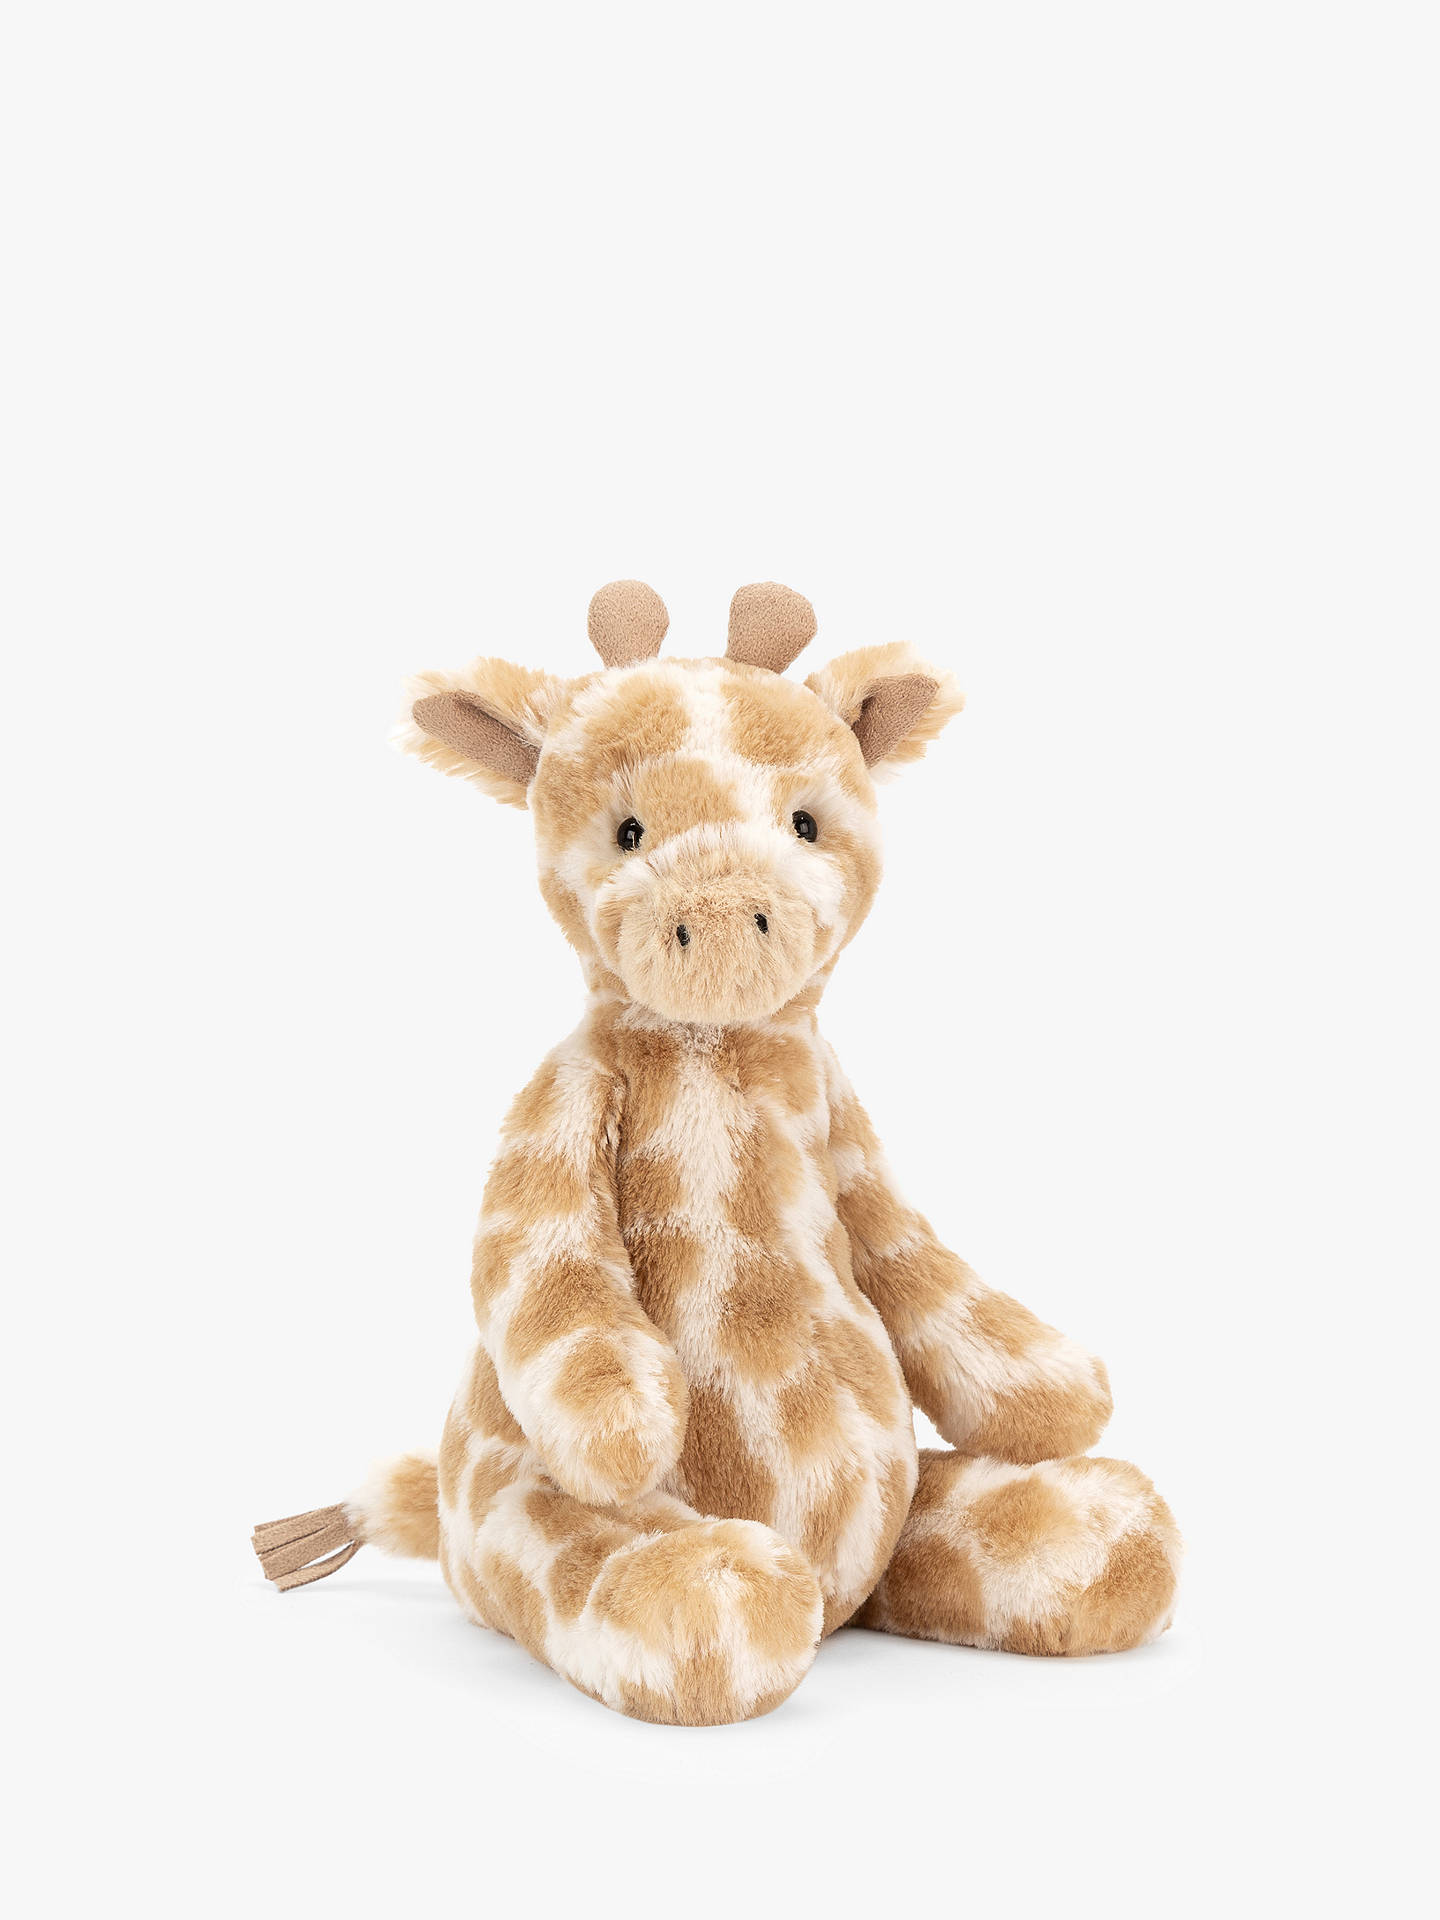 db920e8aa9a Buy Jellycat Puffles Giraffe Soft Toy